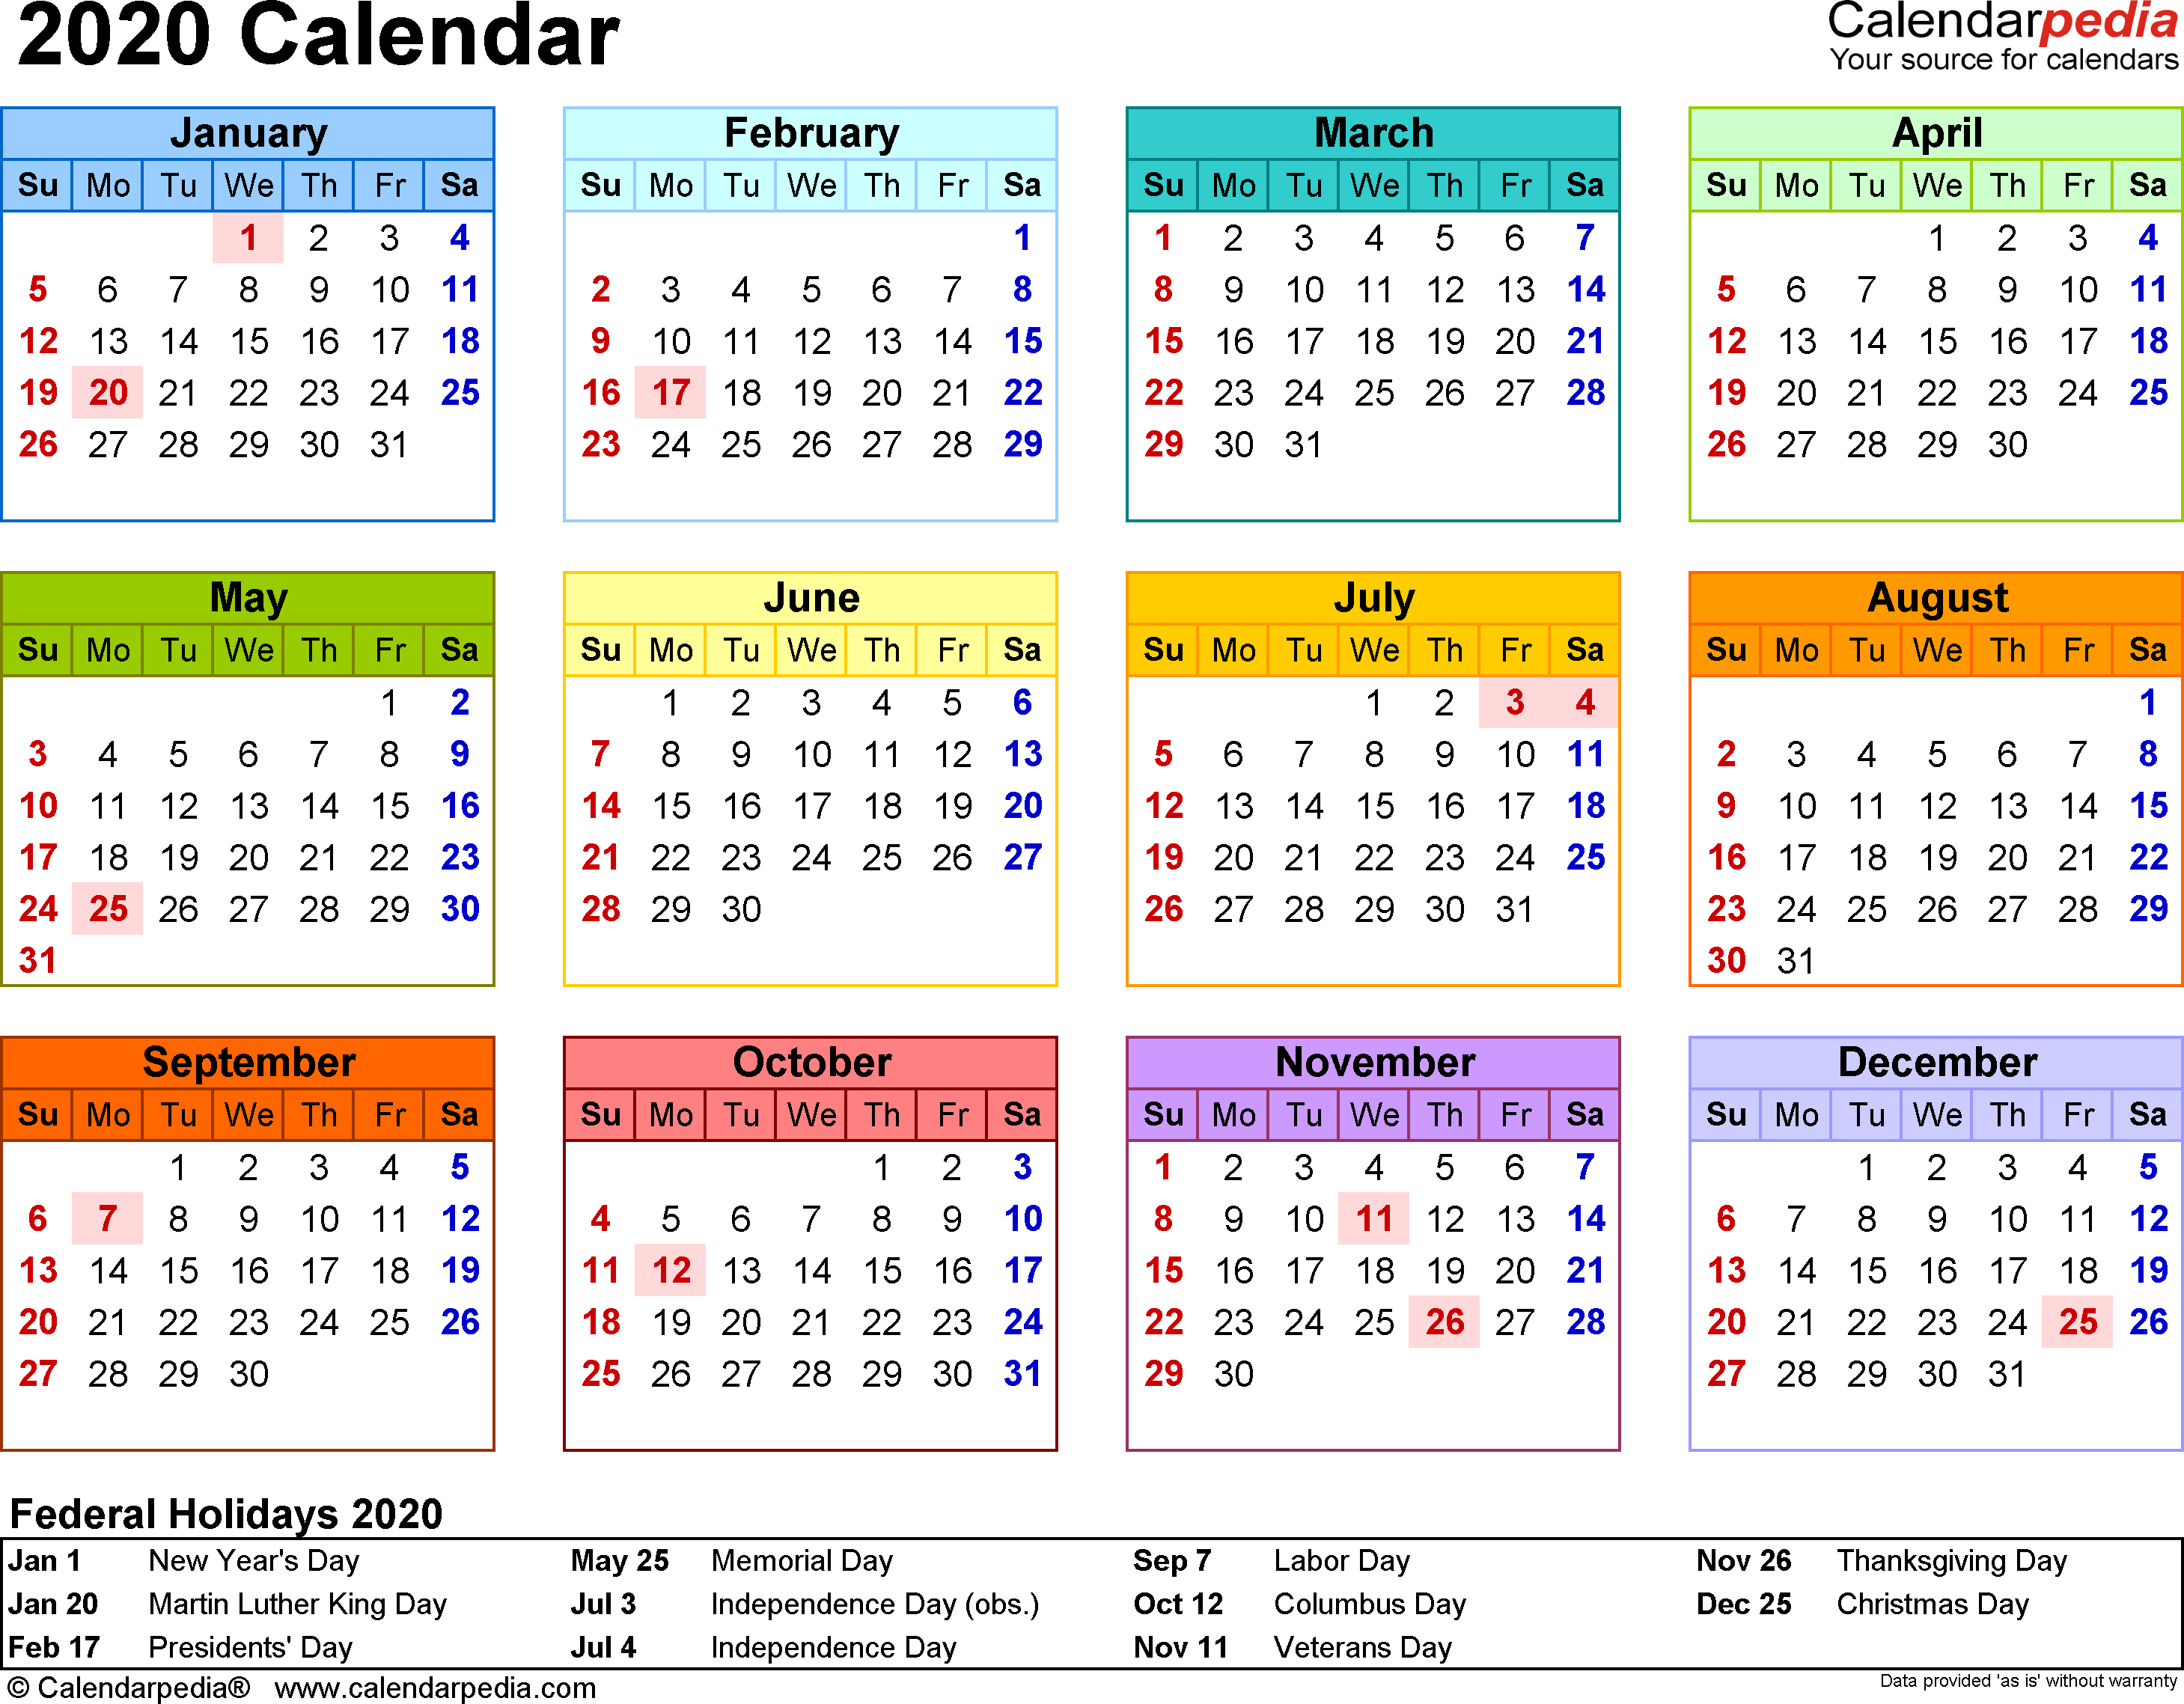 Calendar 2020 Printable - Tunu.redmini.co